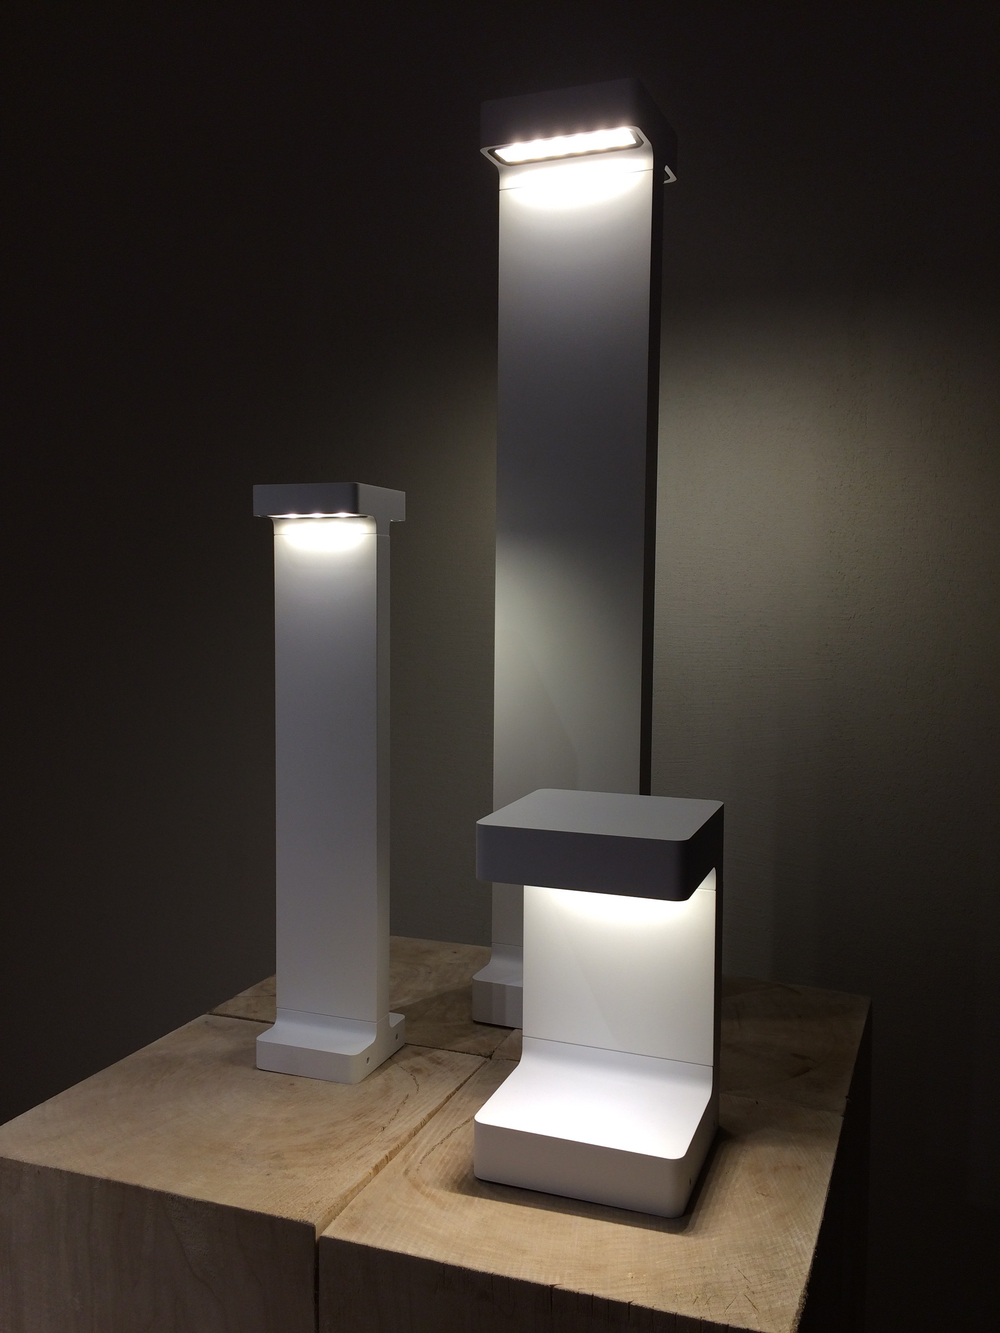 6-vincent_van_duysen_designer_of_the_year_biennale_interieur_kortrijk_belgian_design_belgijski_projektant_roku_projektowanie_wnetrz_nowoczesne_mieszkanie